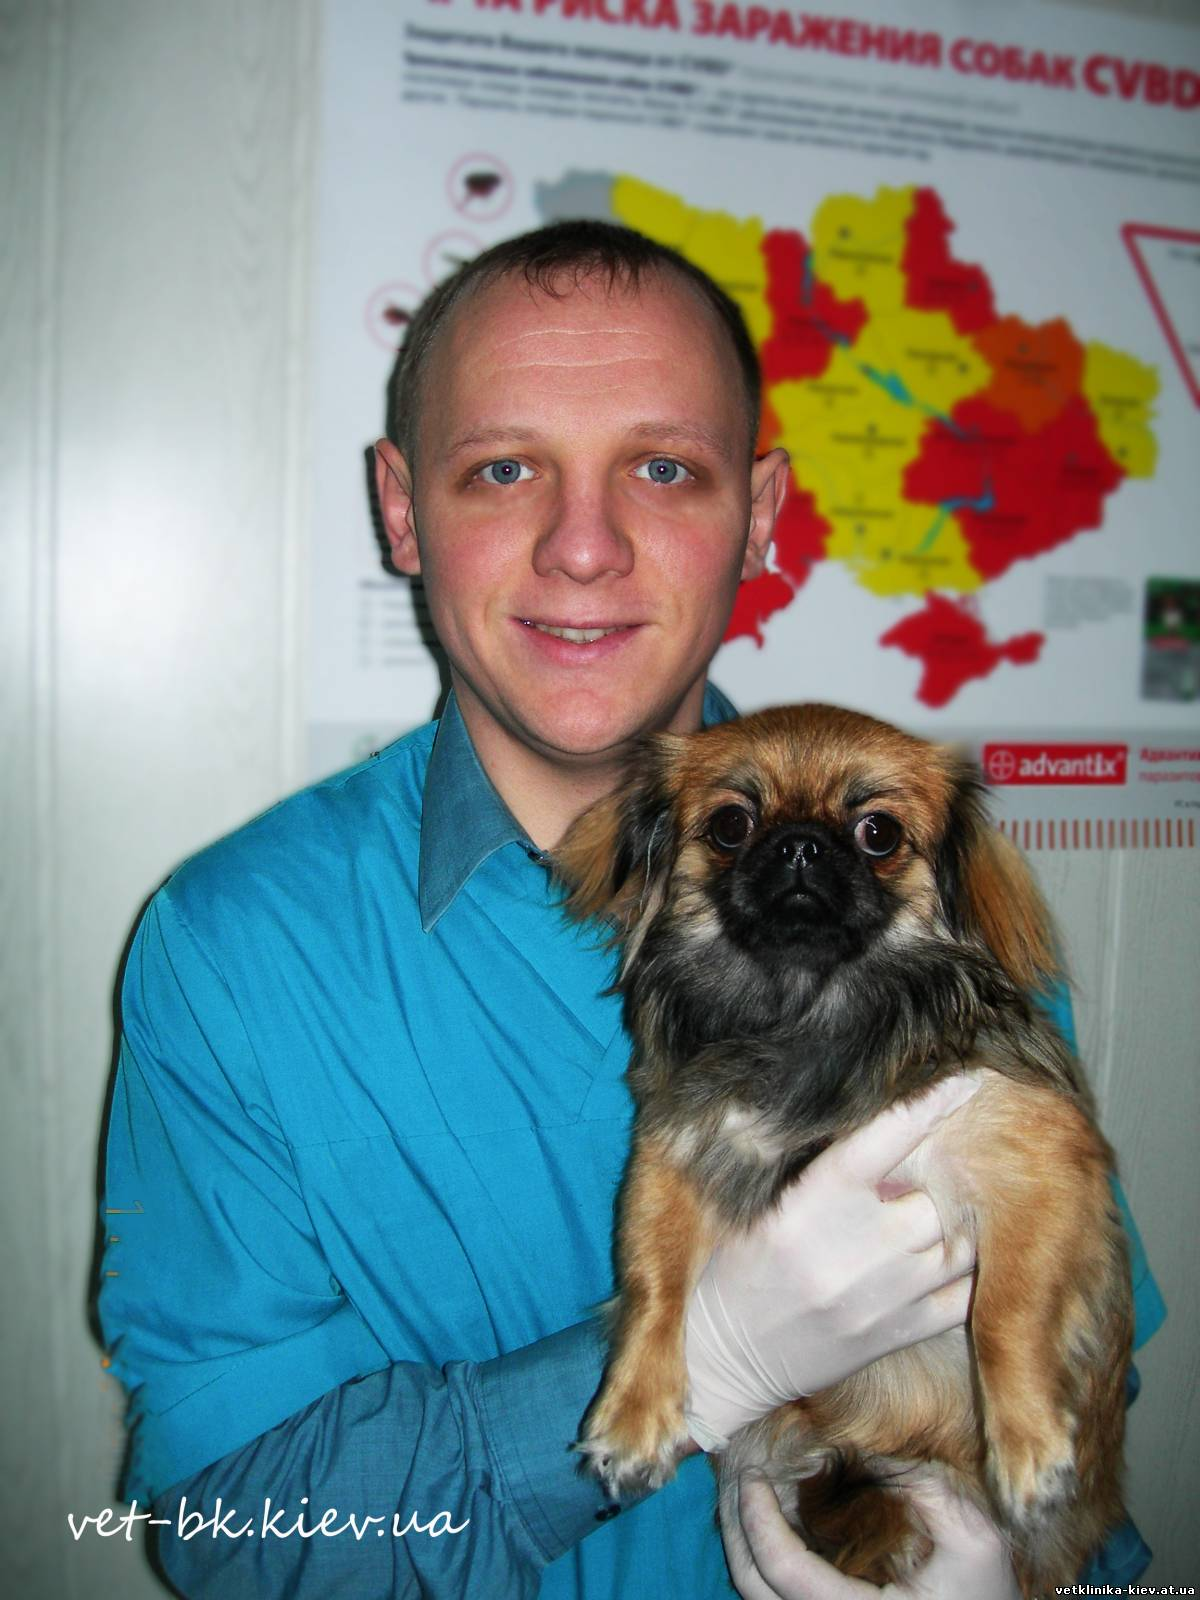 Гриценко Юрий Владимирович